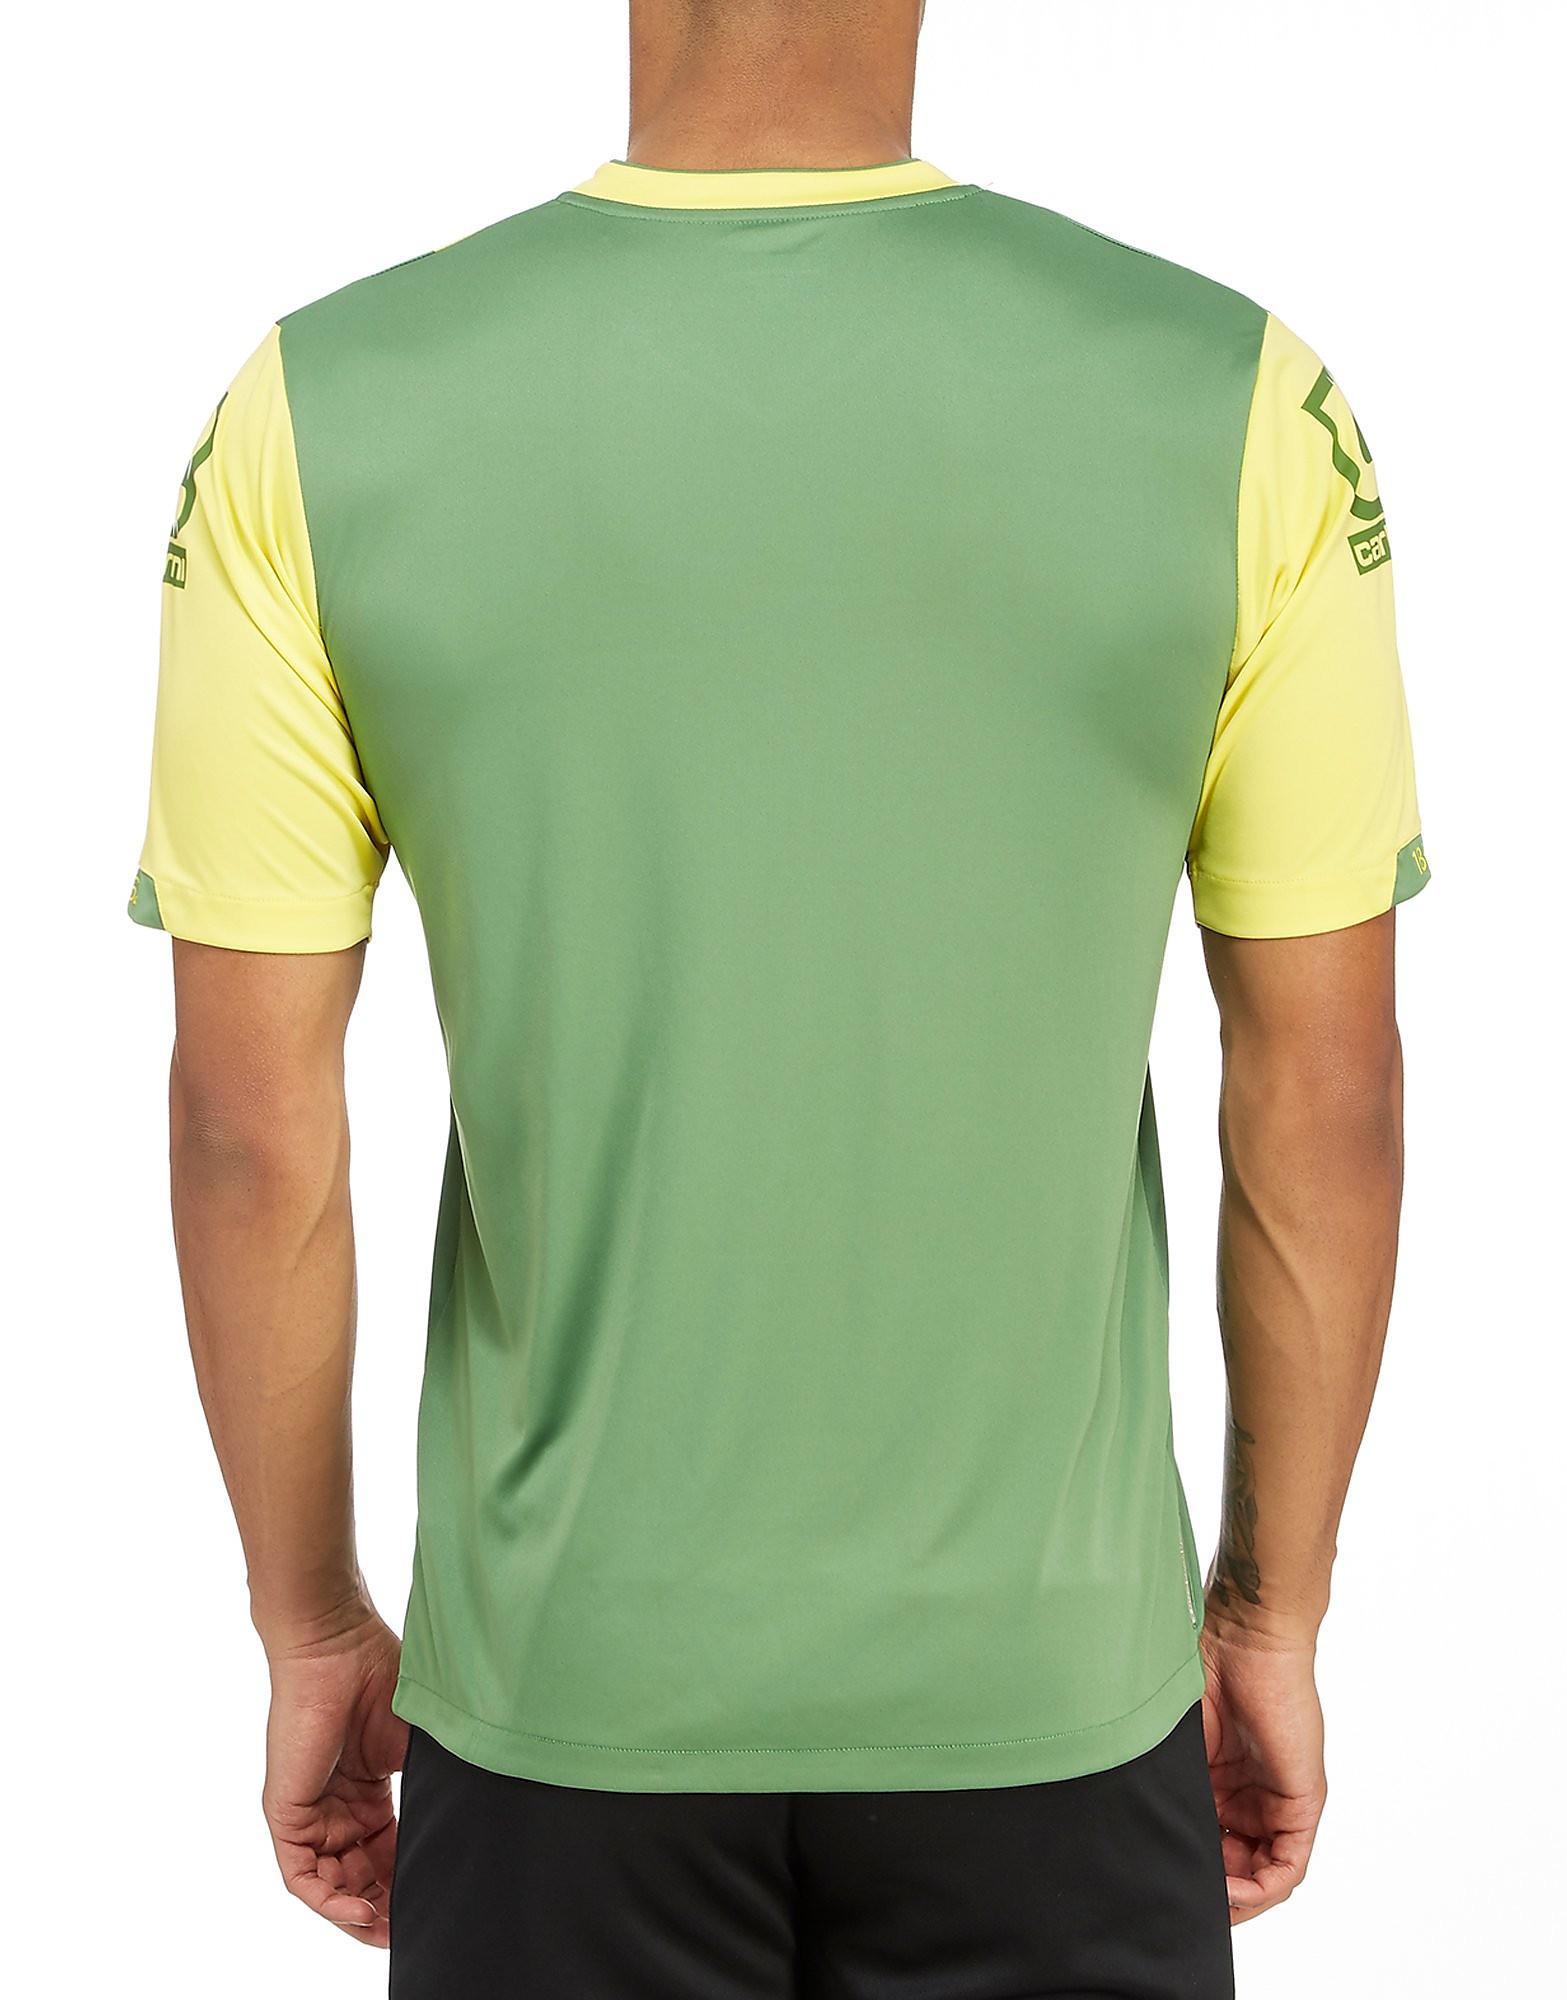 Carbrini Notts County 2014 Away Shirt